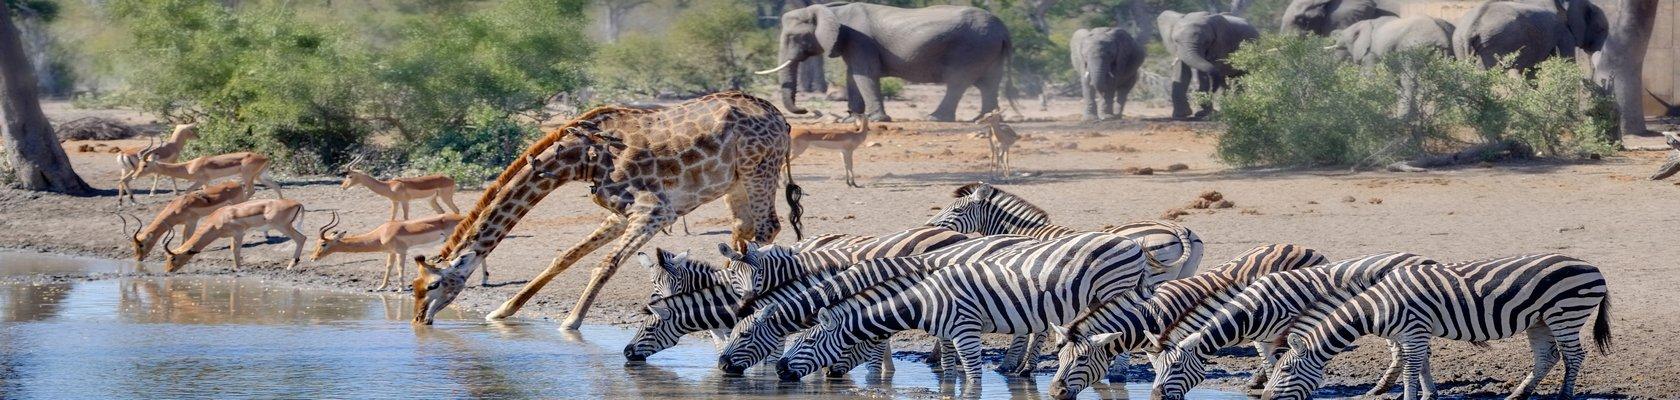 Wilde dieren in Kruger Nationaal Park